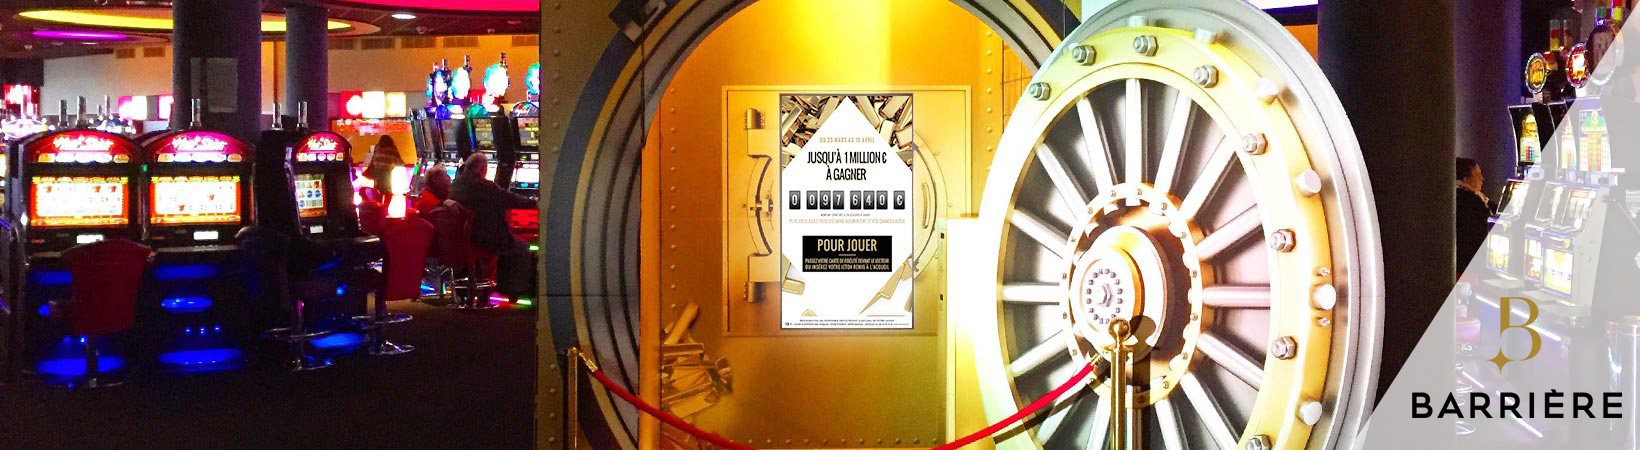 banniere-casino-barriere-arsenal